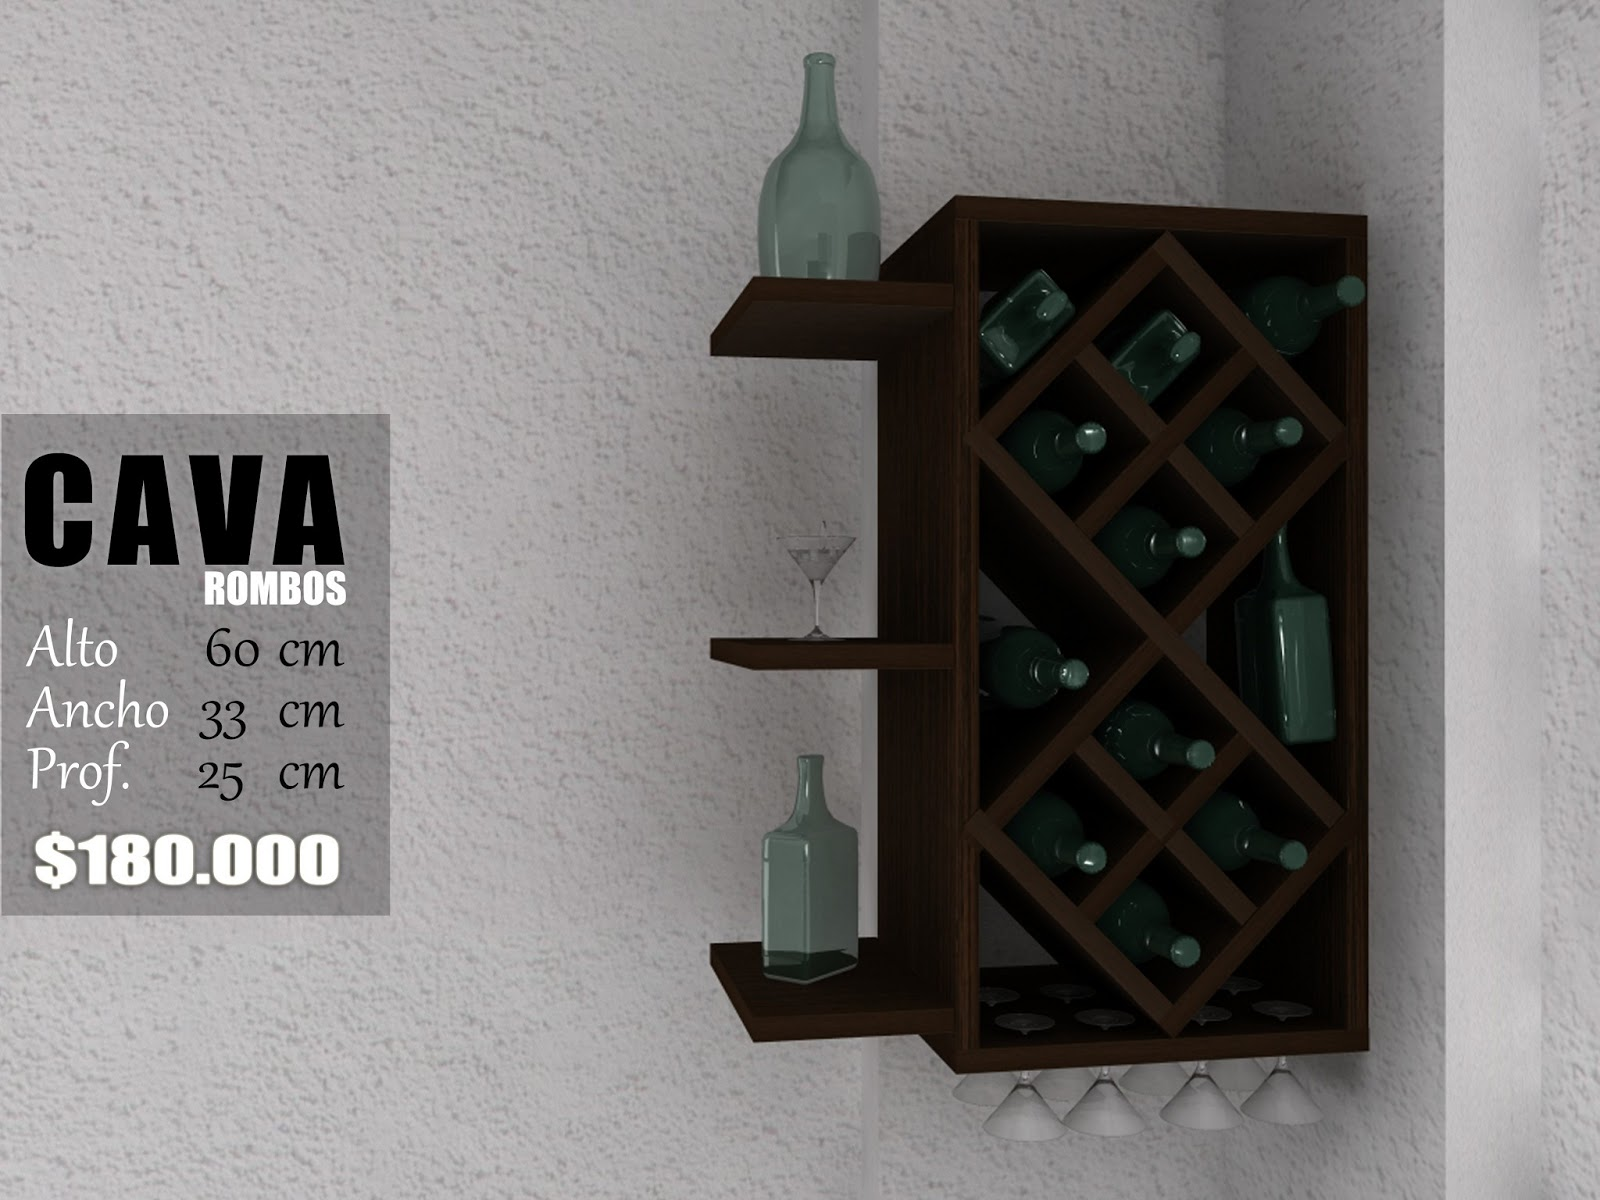 Cava rombos shabry - Cavas de vino para casa ...